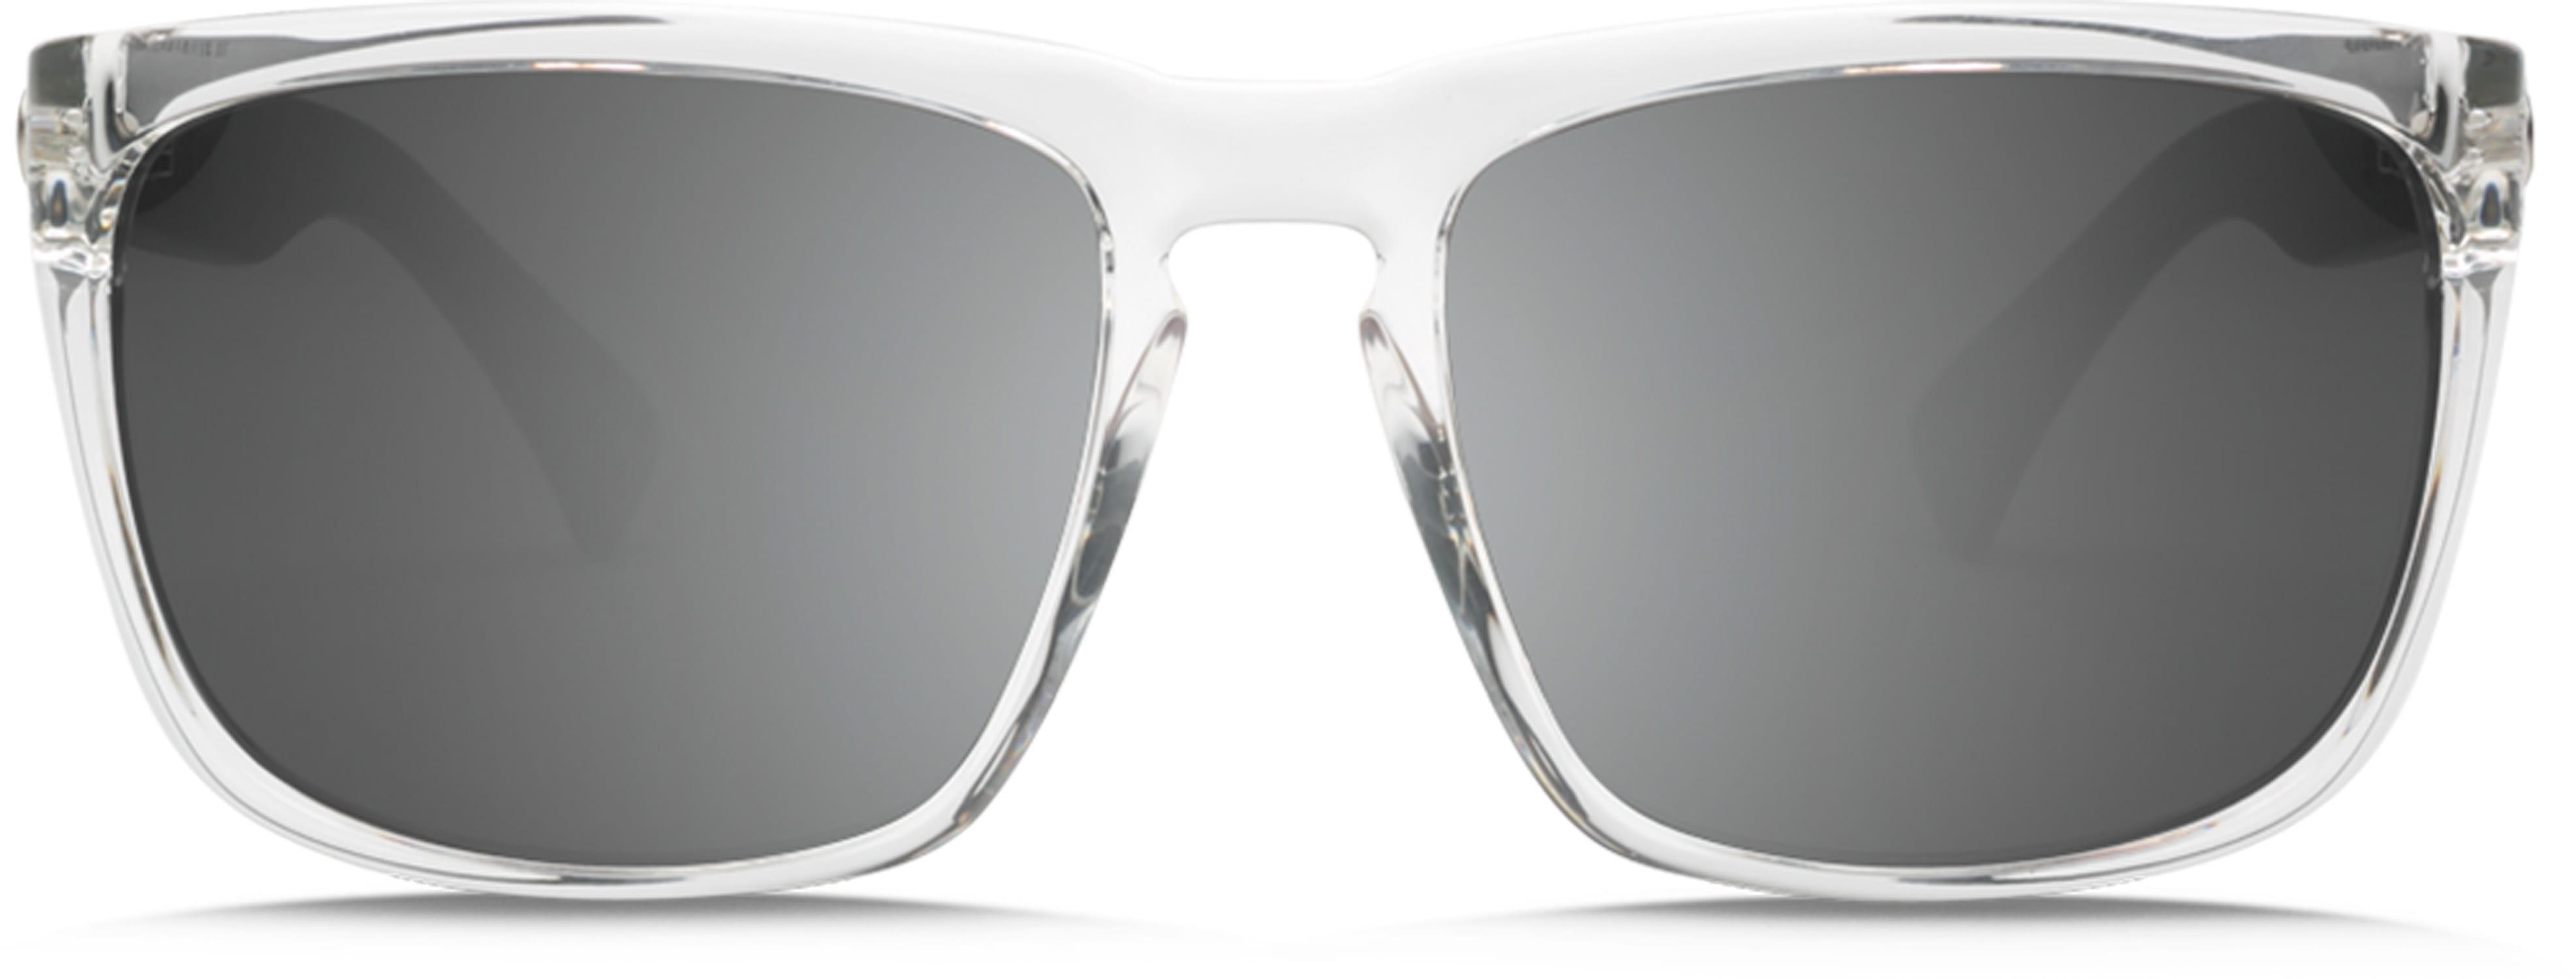 948e6acf26 Electric Knoxville XL Sunglasses - thumbnail 2